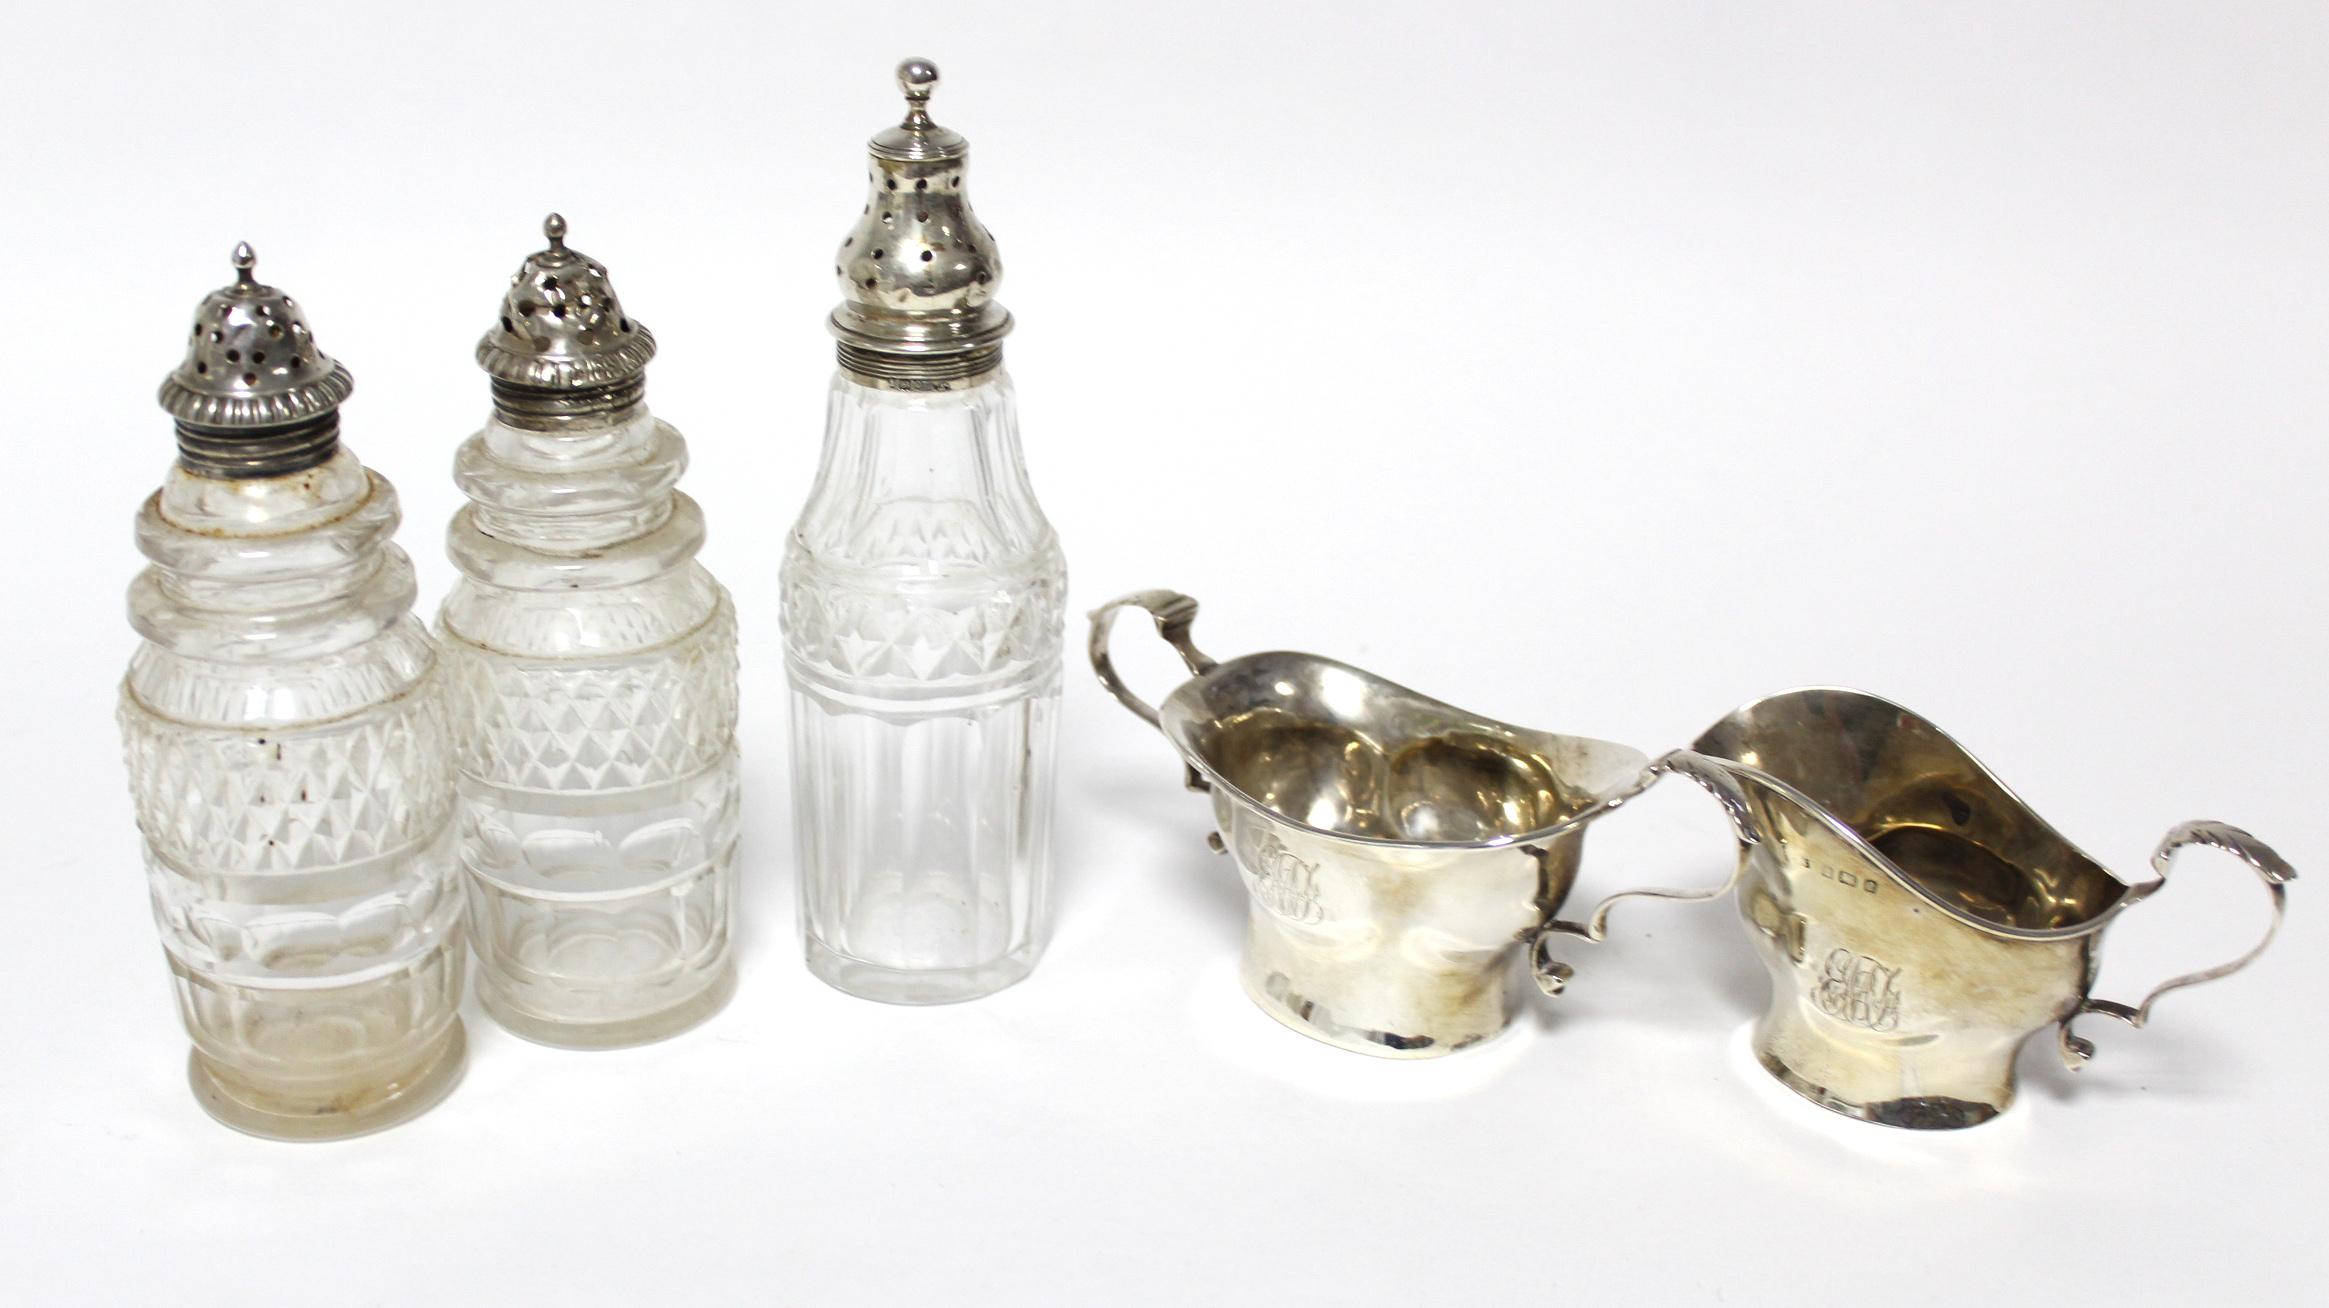 Lot 20 - An Edwardian sugar bowl & matching cream jug, Birmingham 1902, by Jones & Crompton; together with